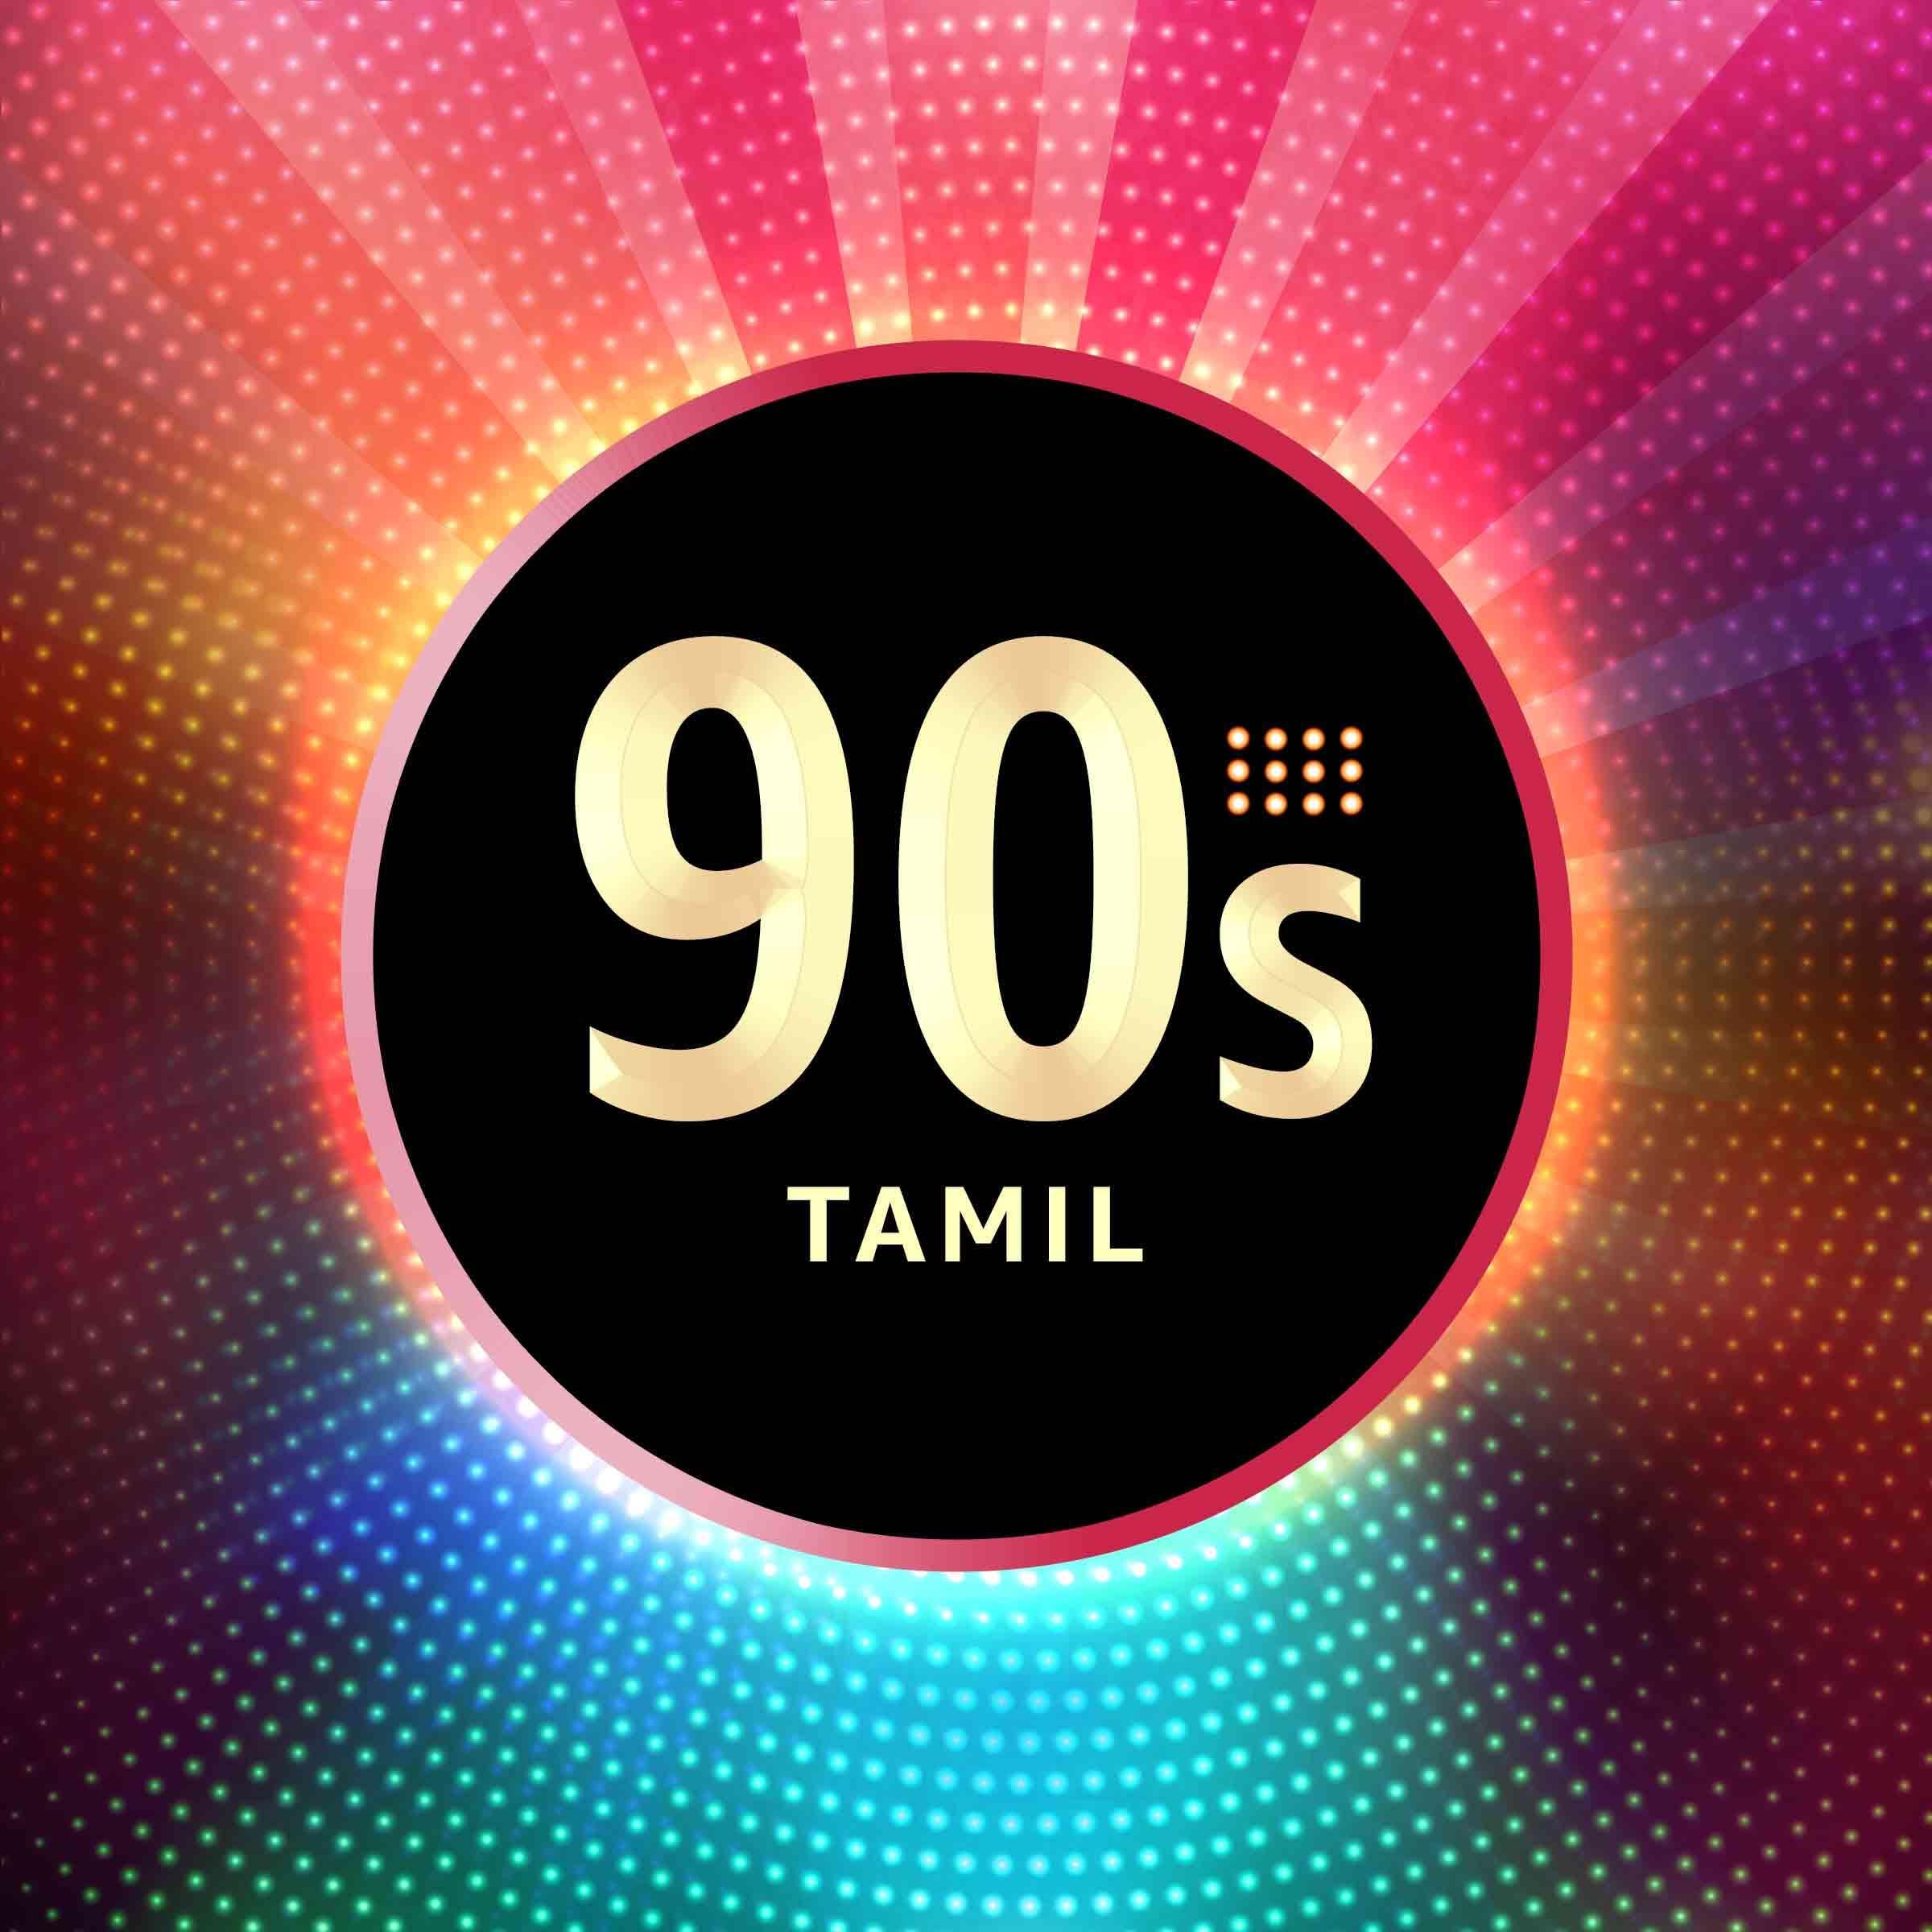 90s Tamill